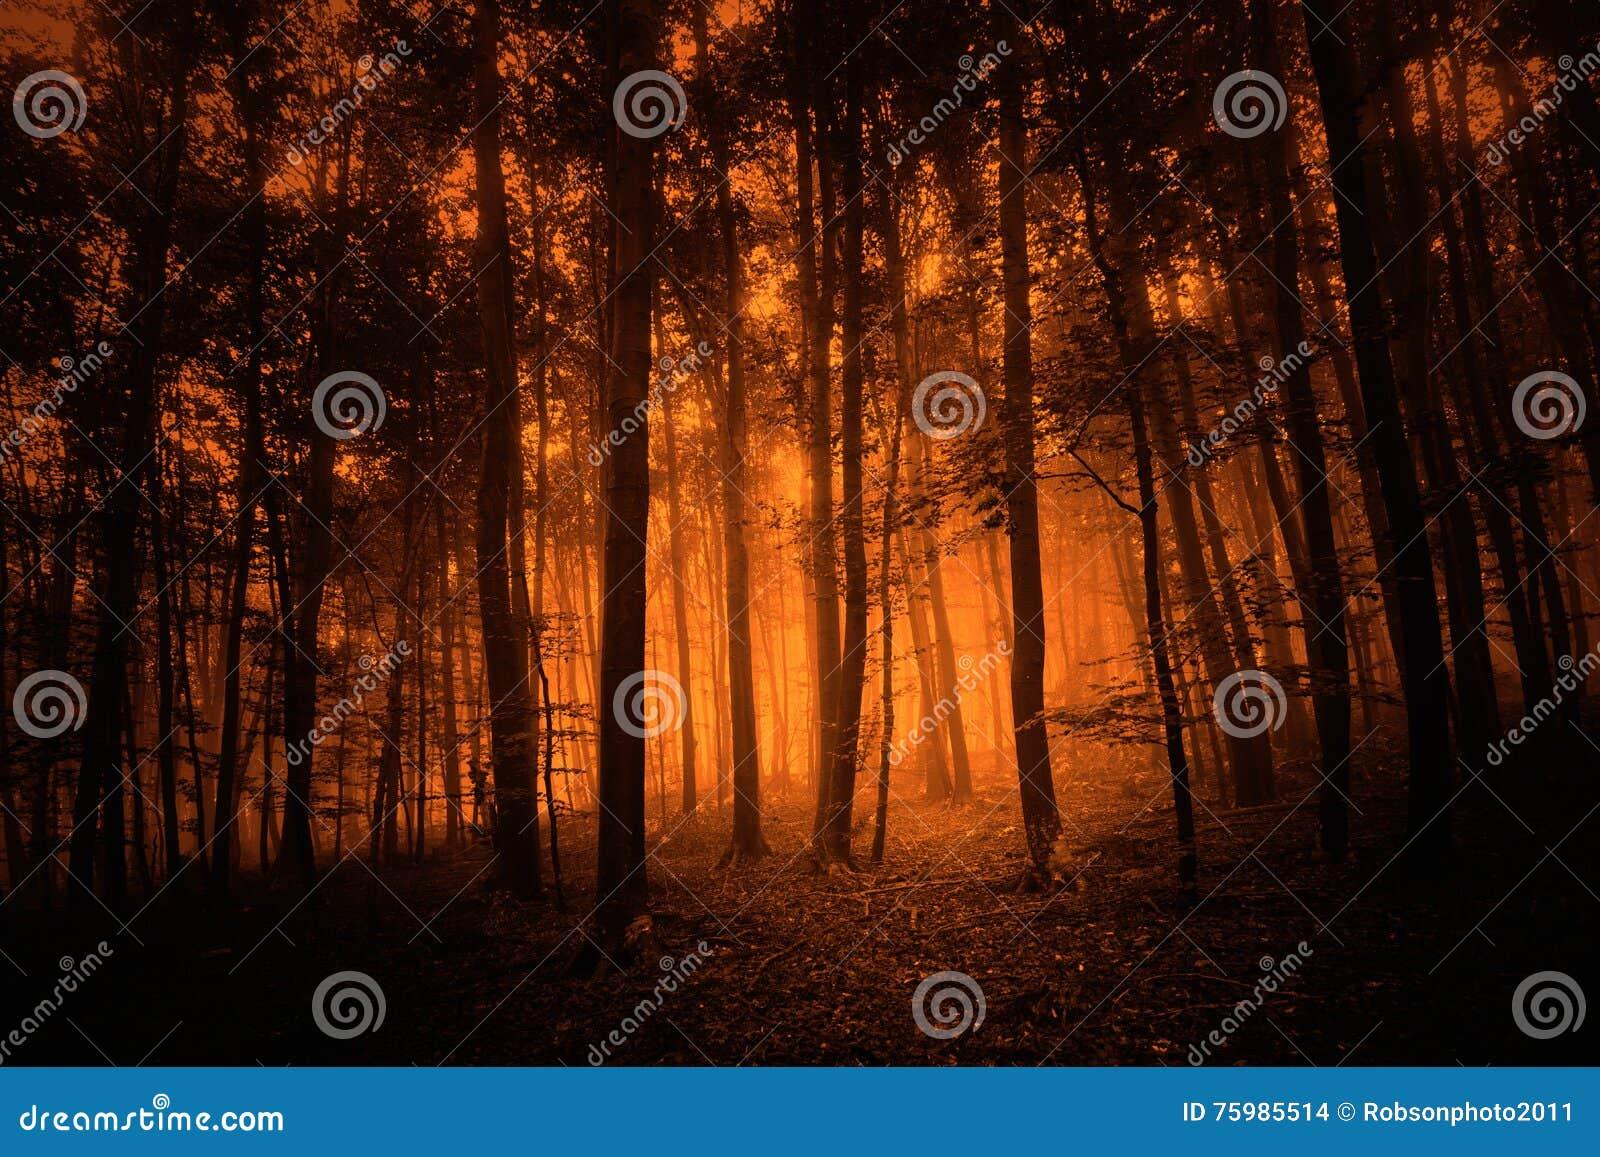 Fondo coloreado rojo oscuro del bosque del misterio